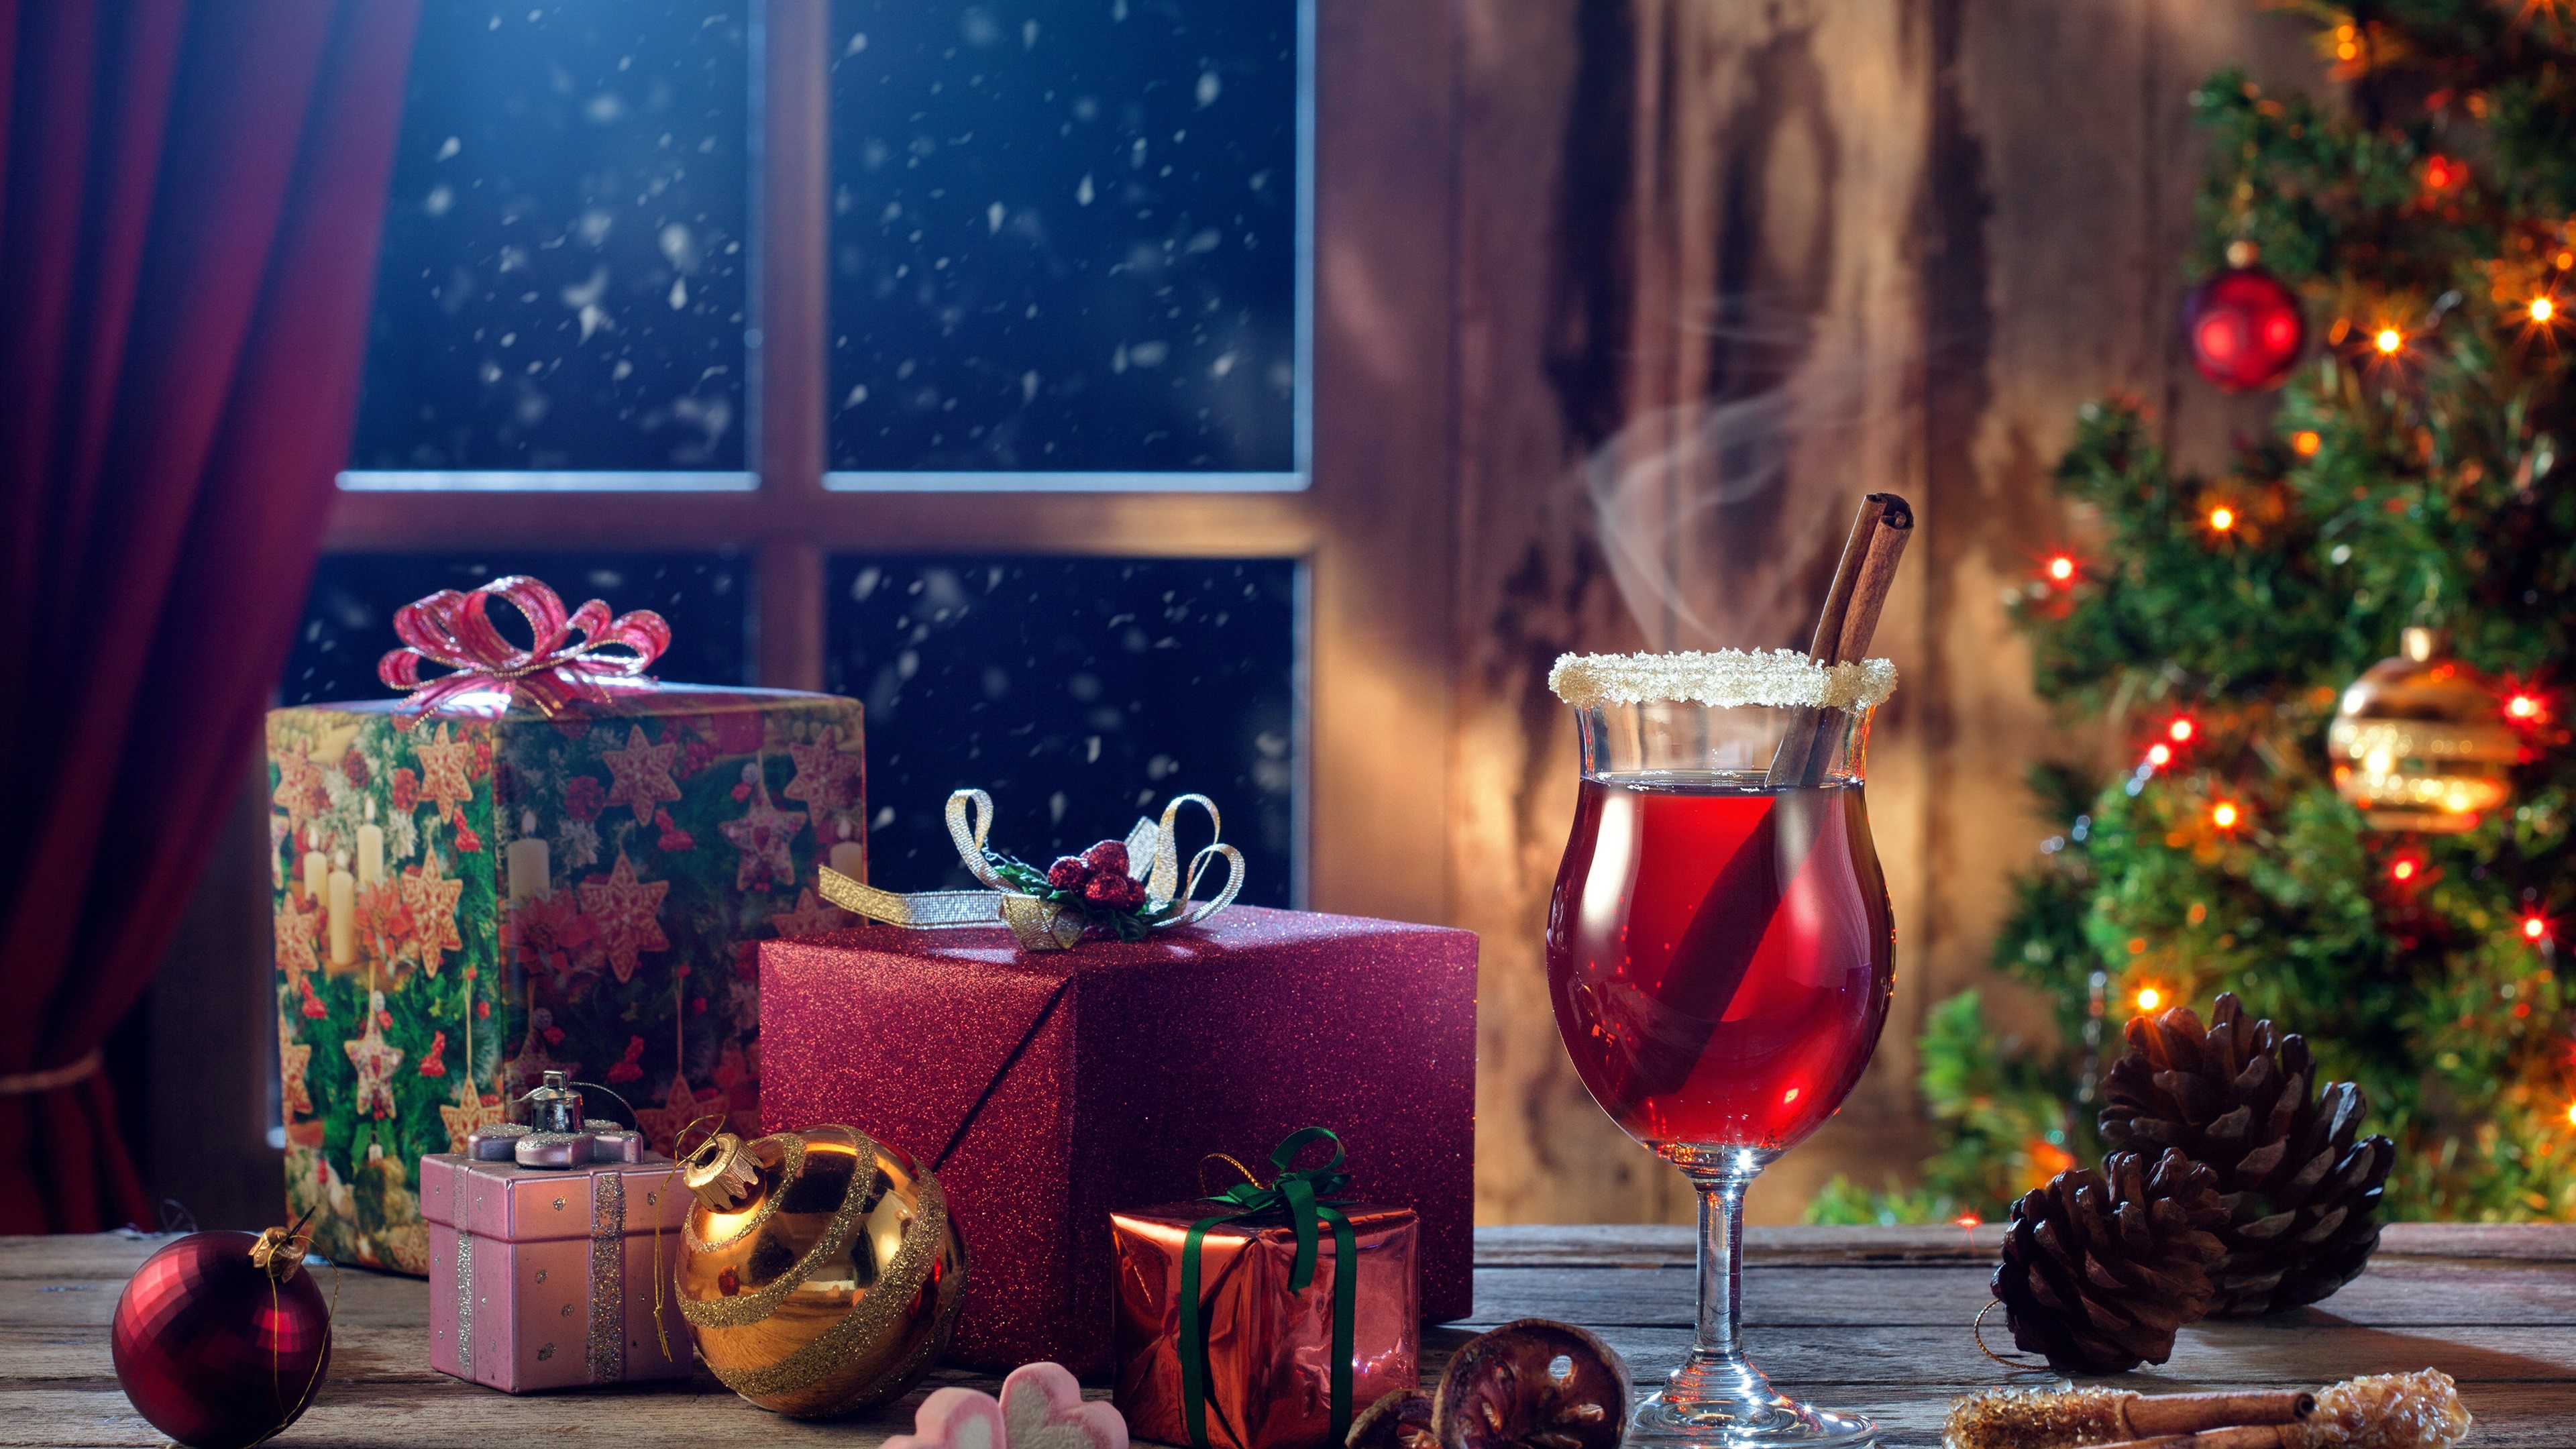 General 3840x2160 holiday stars Christmas Christmas ornaments  presents